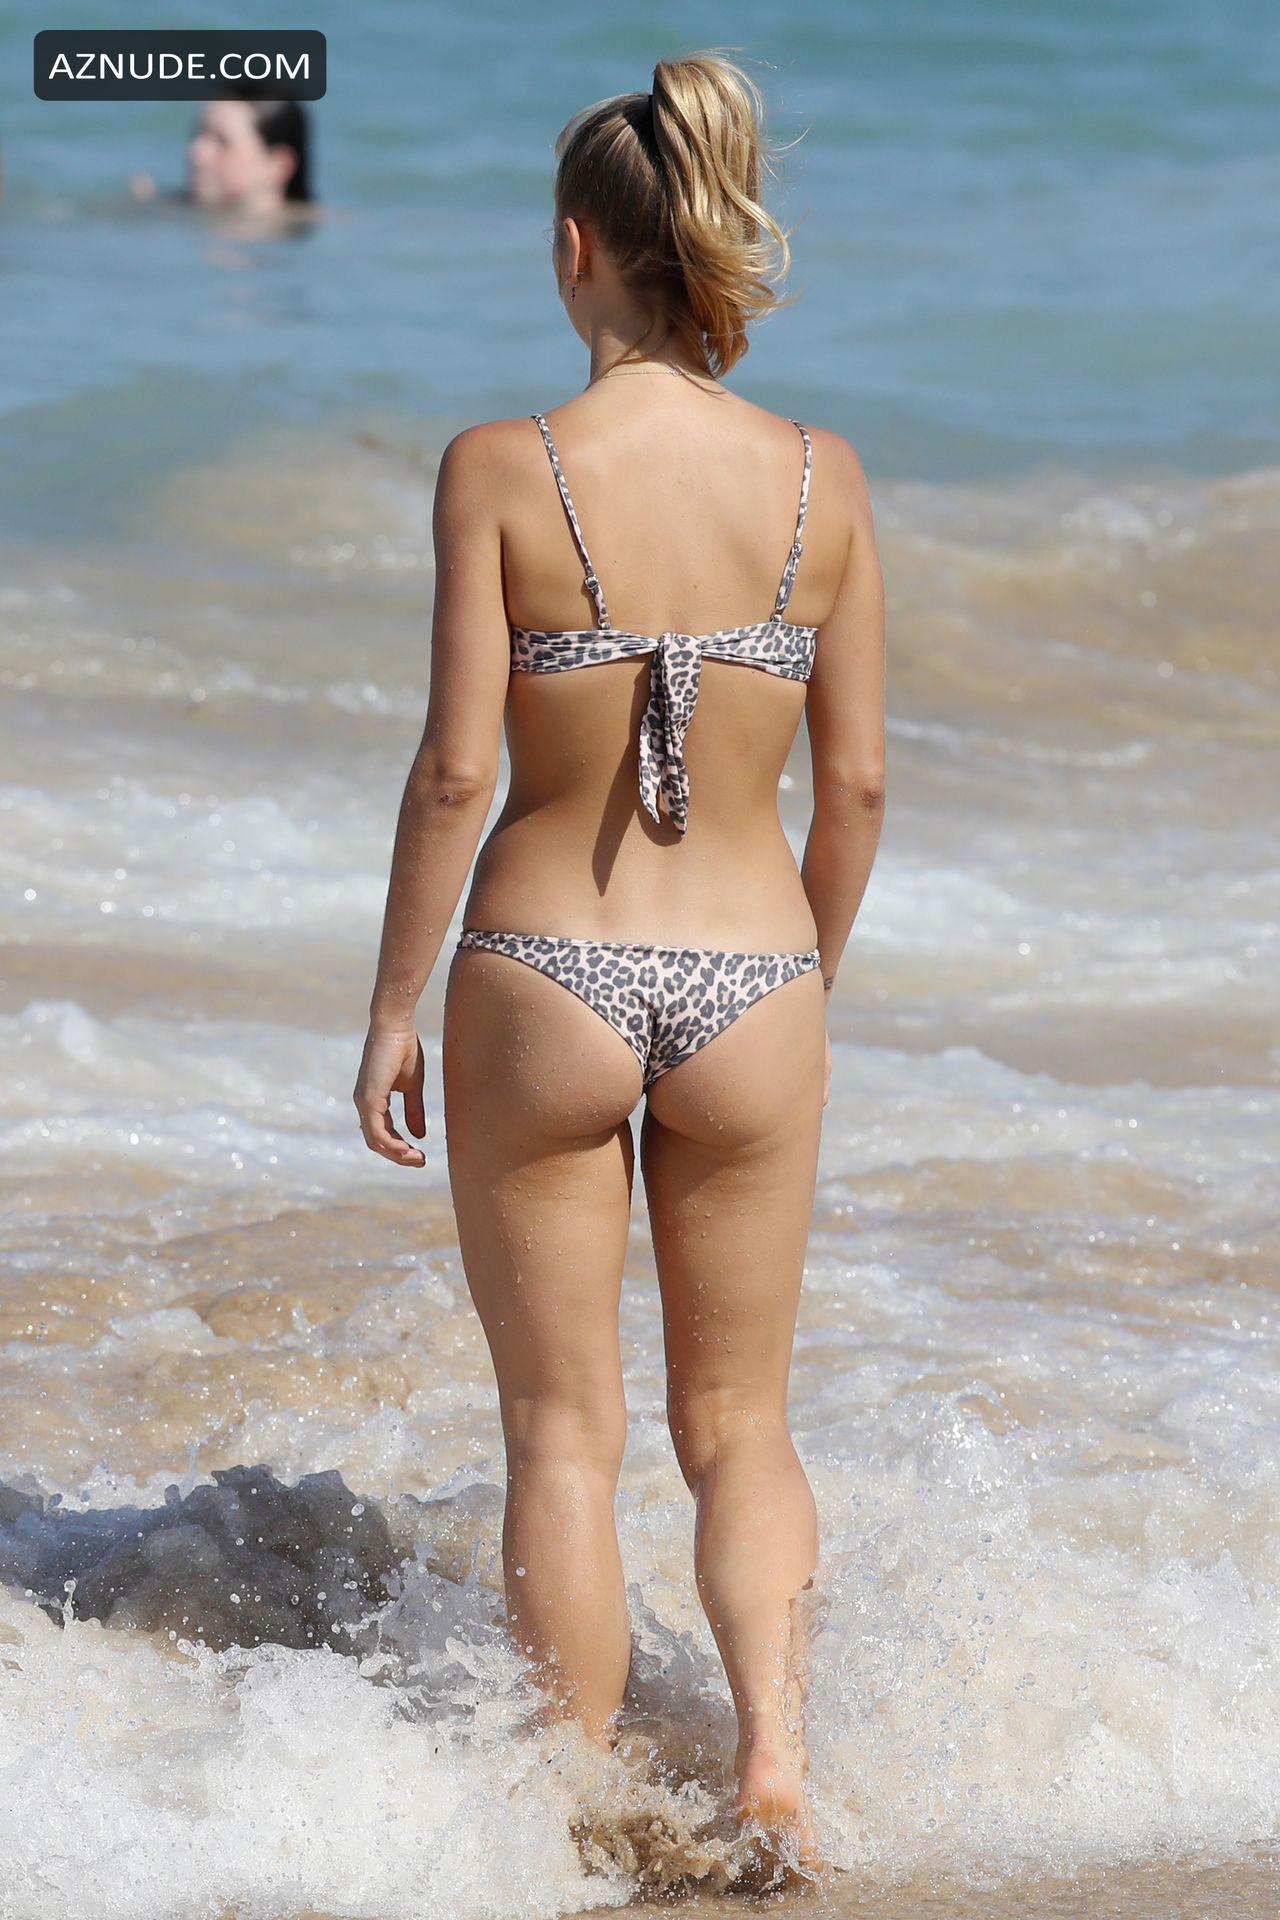 Sailor Brinkley Hits The Beach In A Leopard-Print Bikini -9841